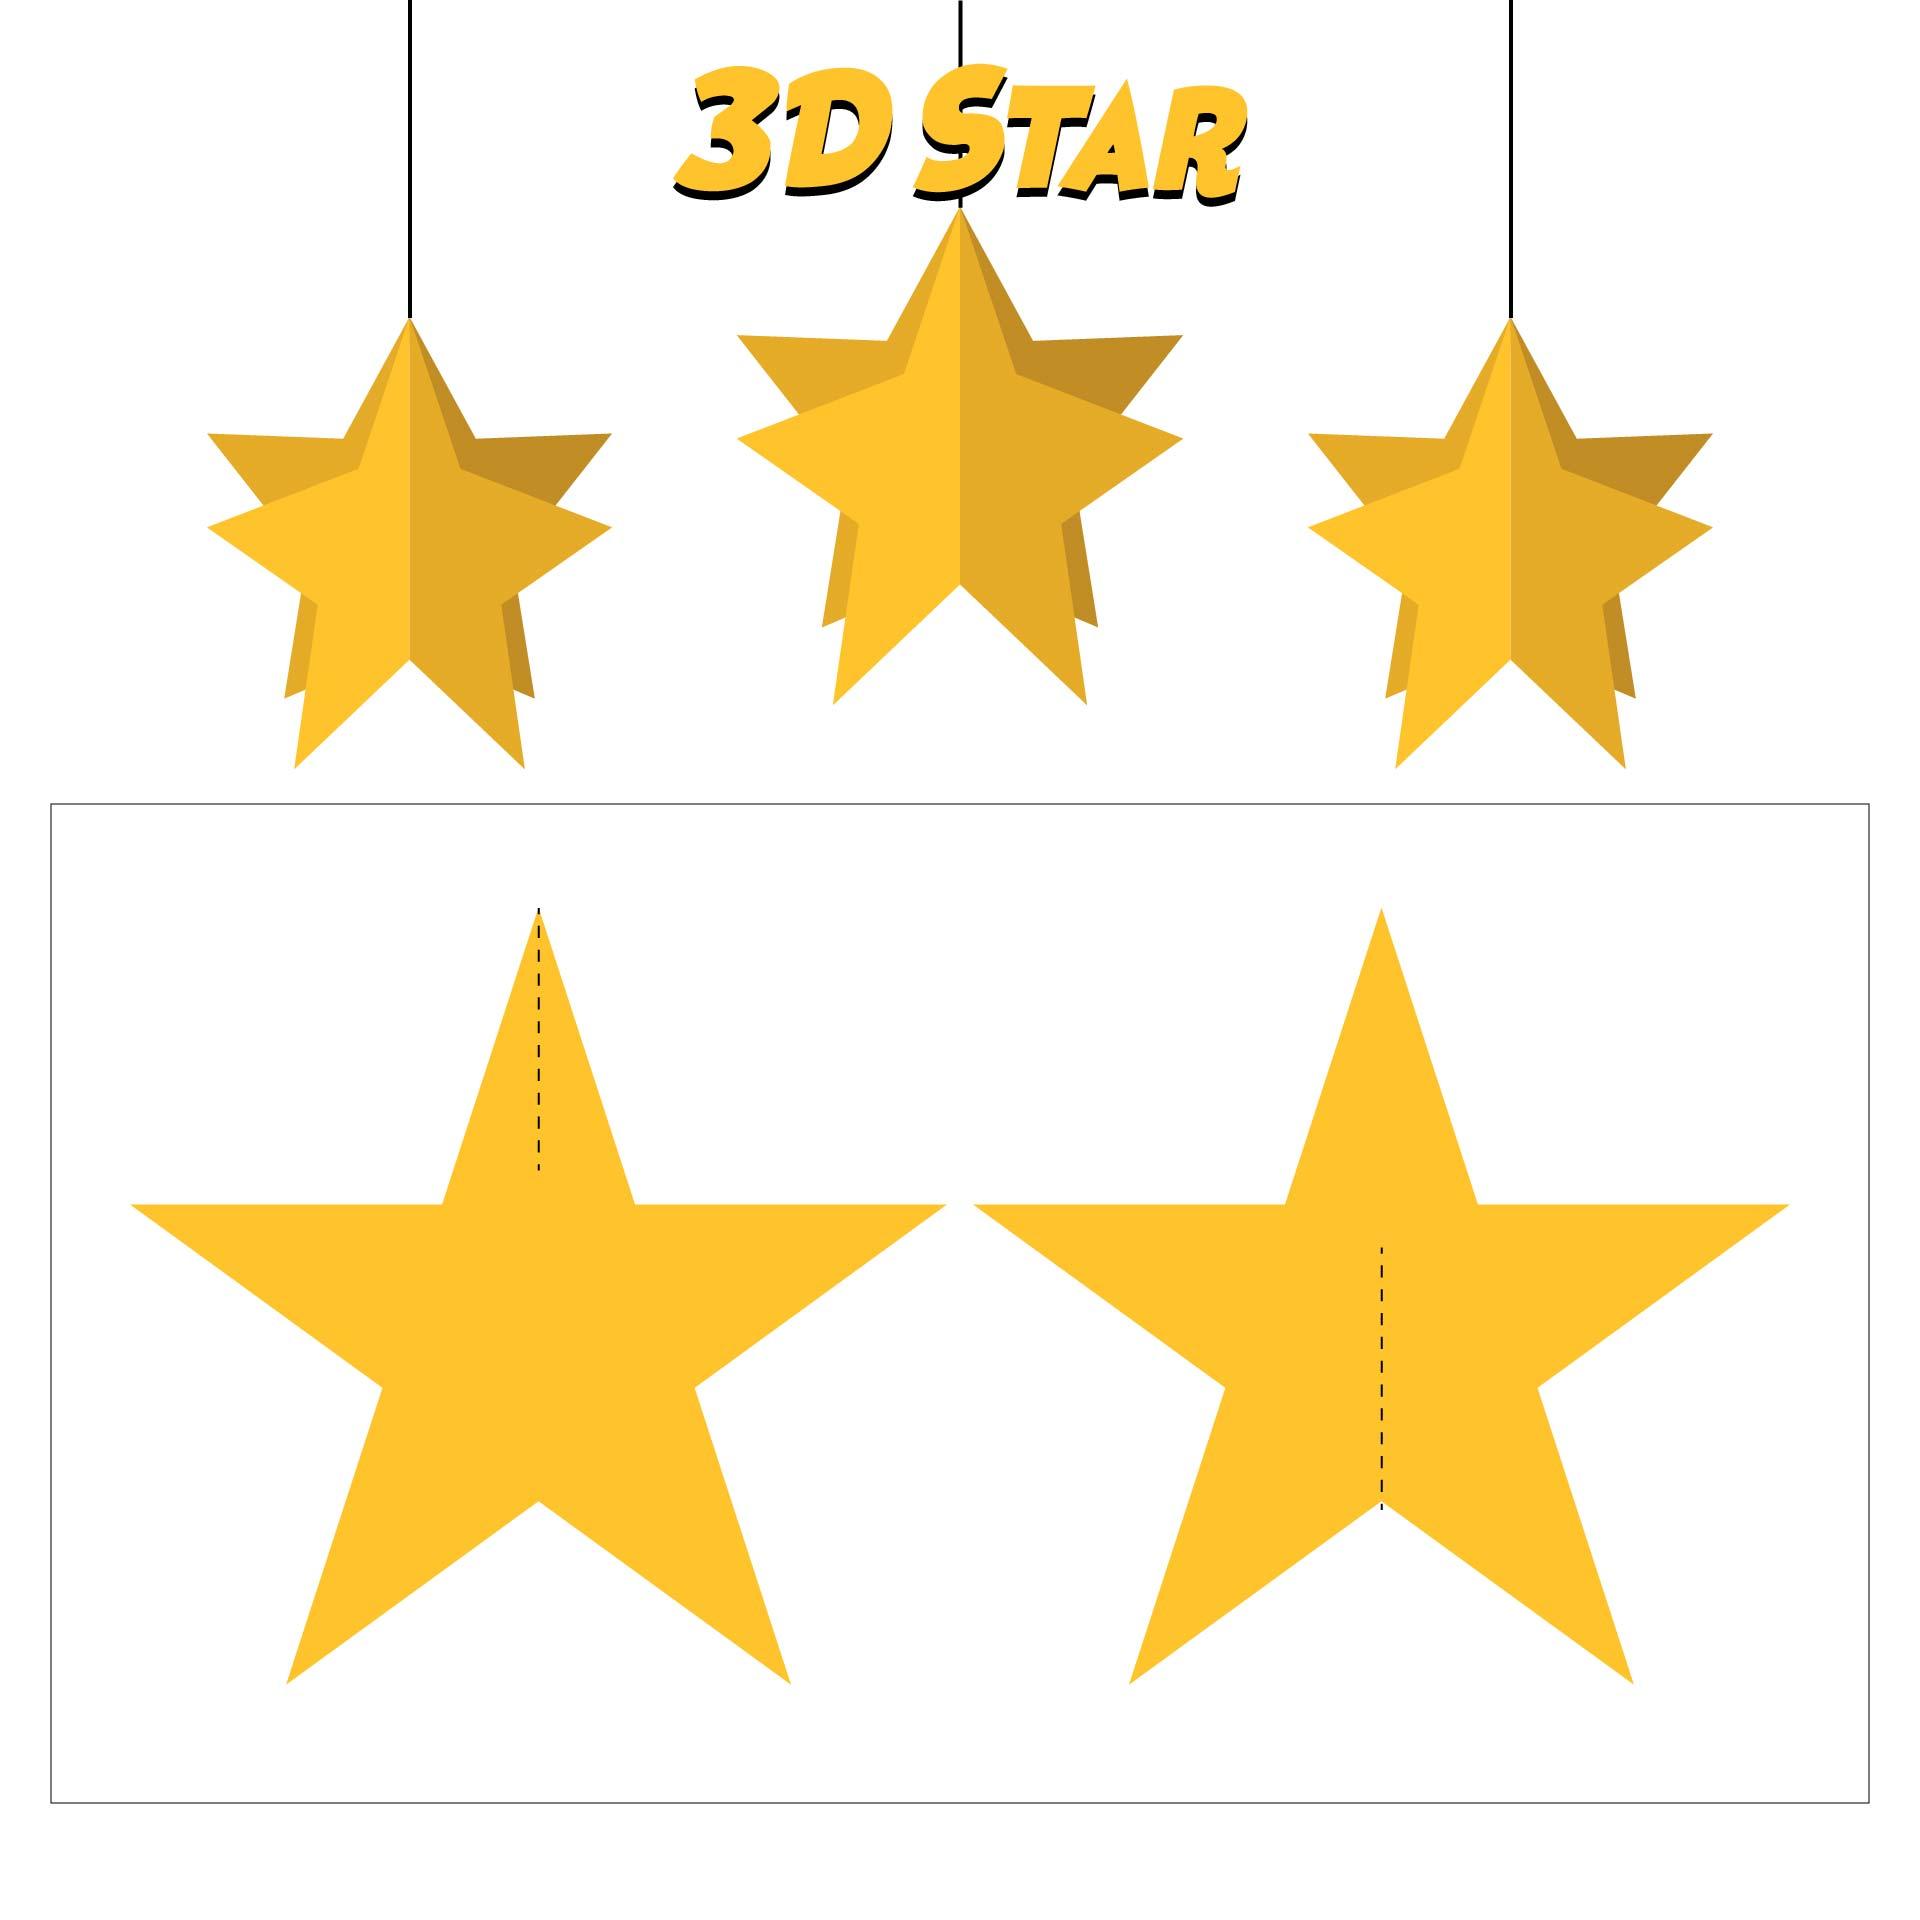 3D Star Ornament Template